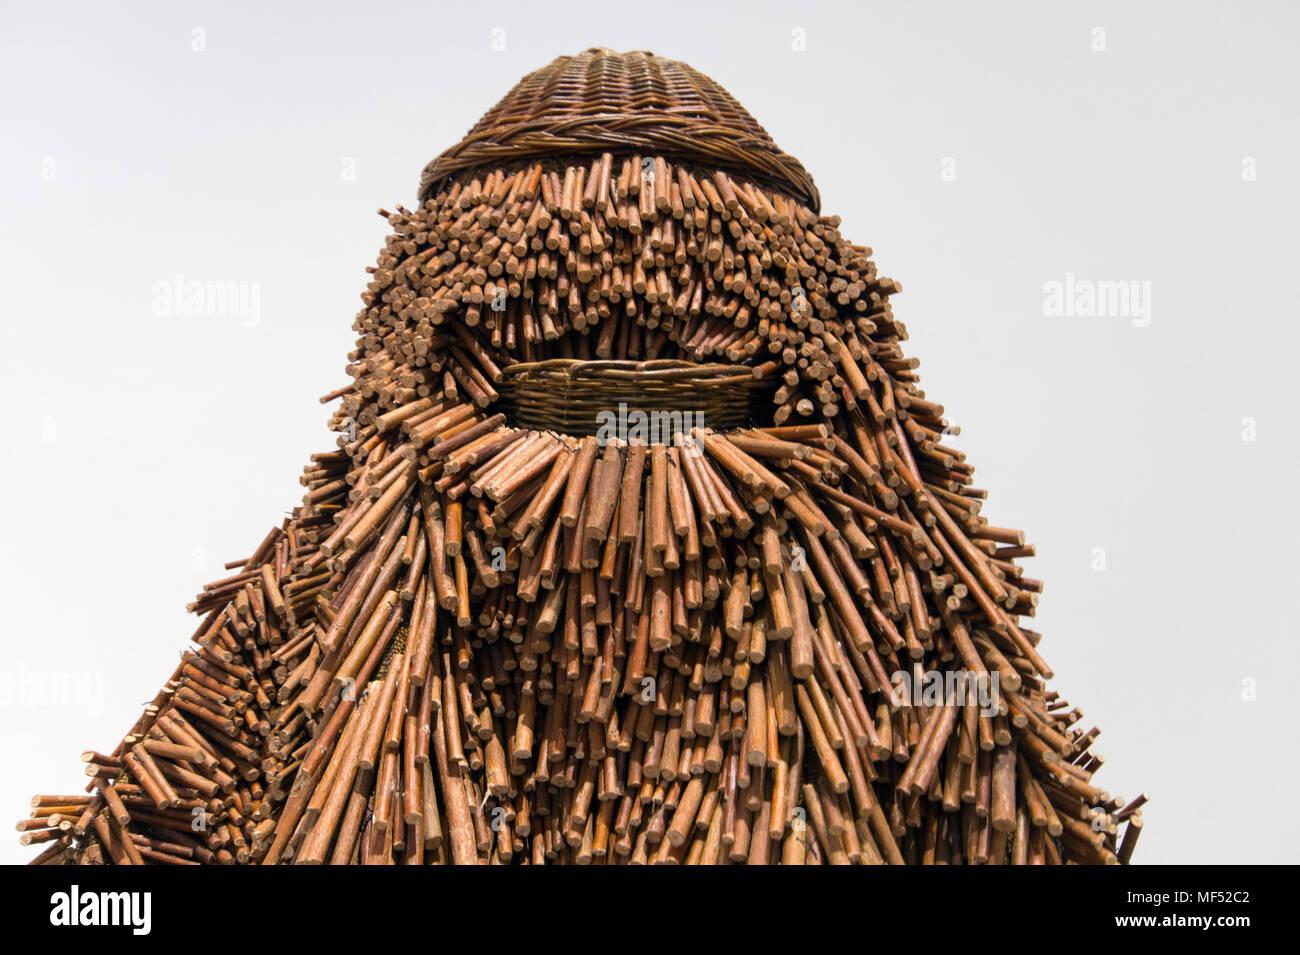 Nick Cave, Soundsuit NCC11.002, 2011, sculptural costume / sculpture - Stock Image